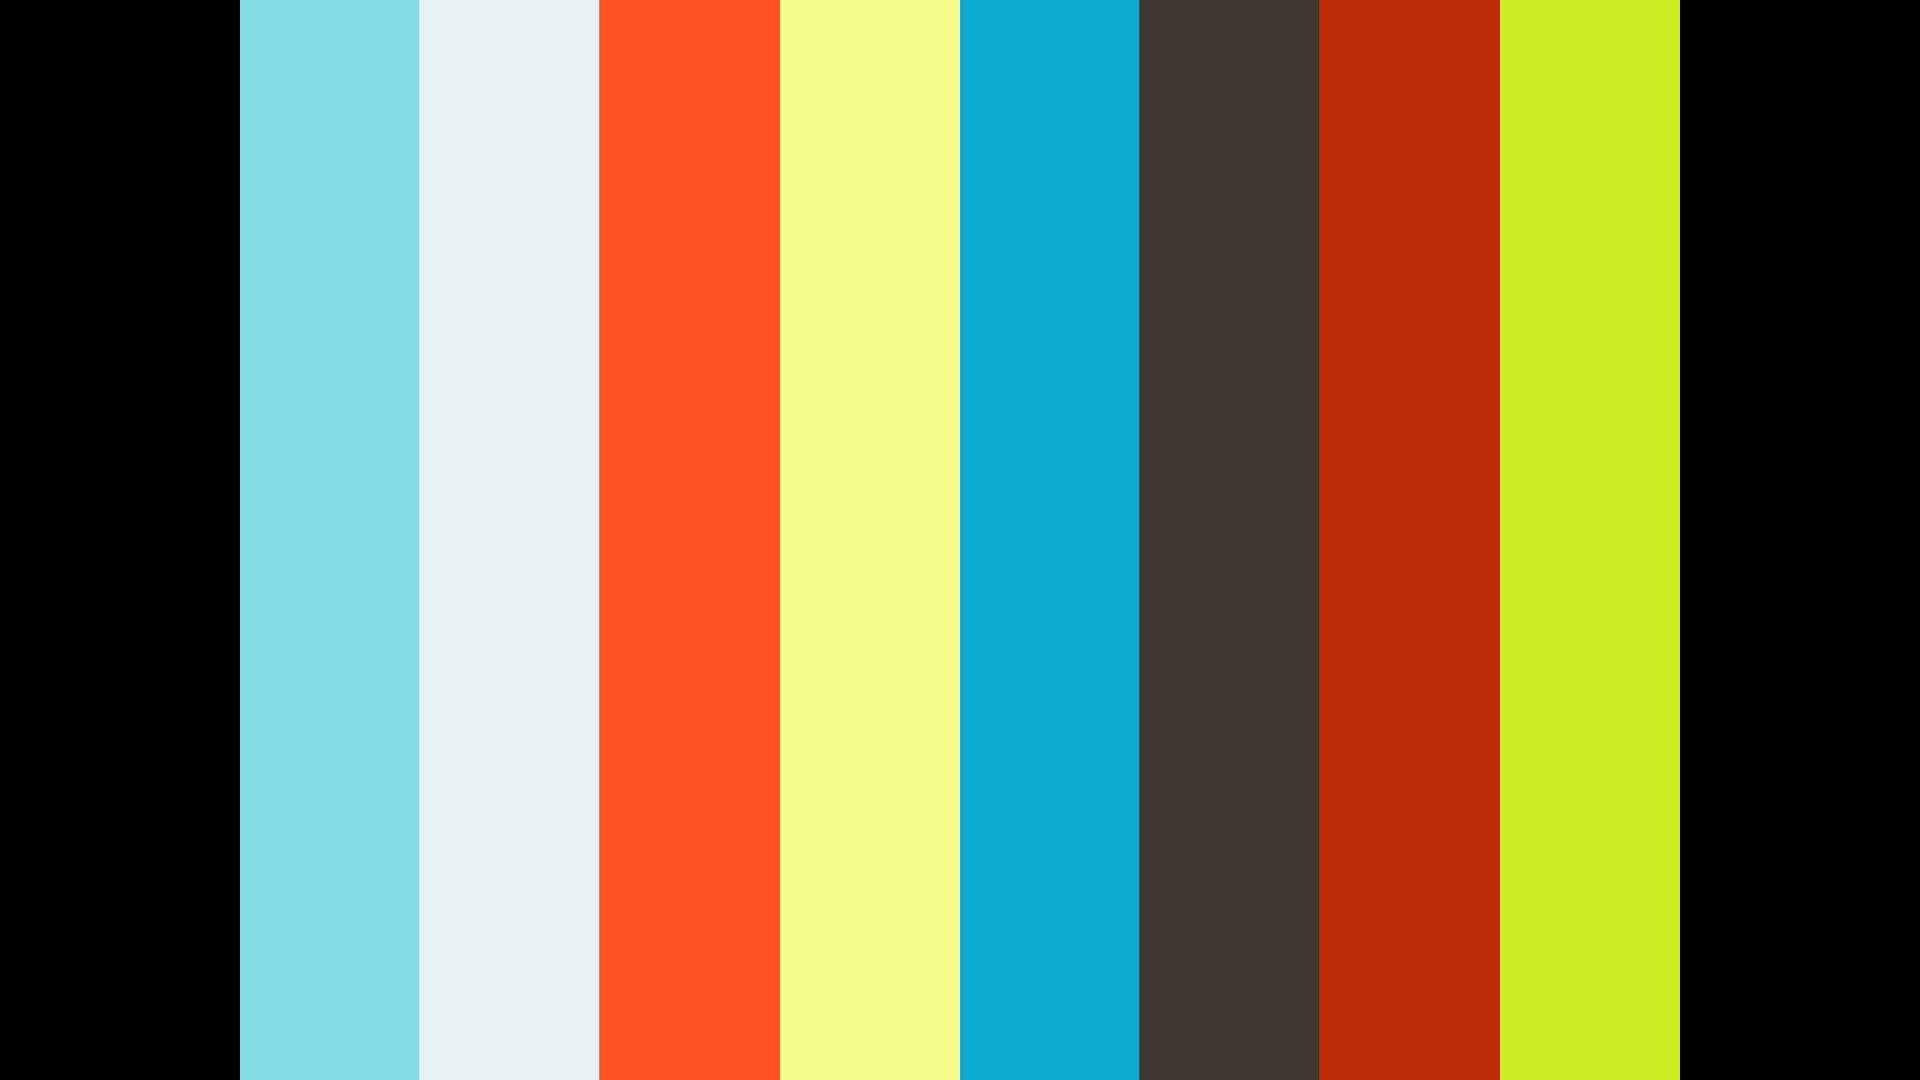 A 19 Des 2019 James Davids - Die 3 verlorenes